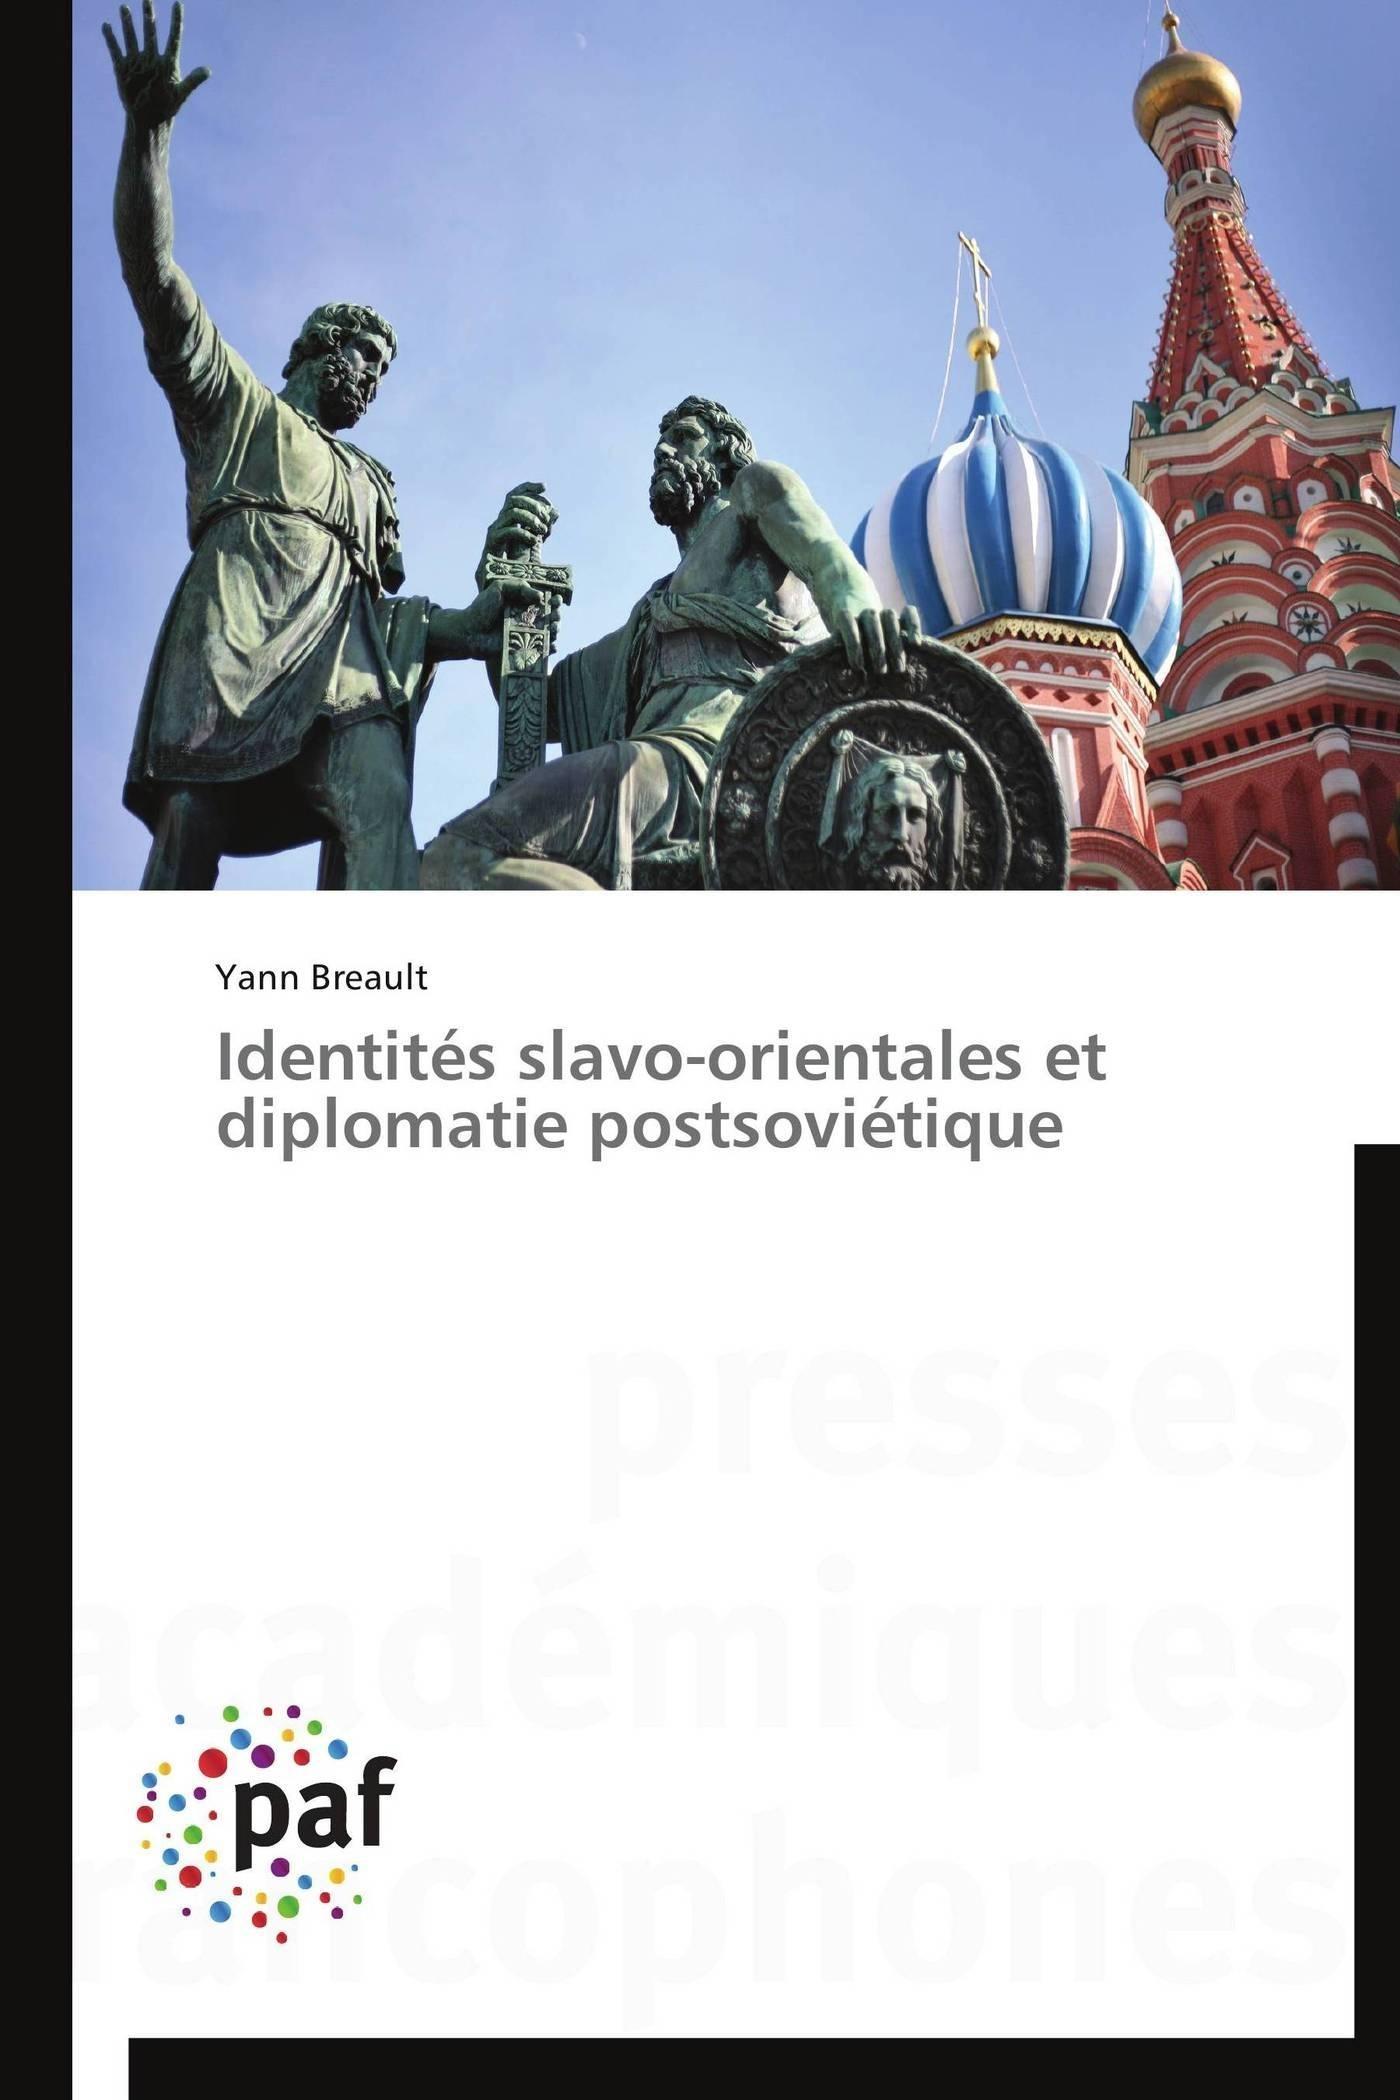 IDENTITES SLAVO-ORIENTALES ET DIPLOMATIE POSTSOVIETIQUE